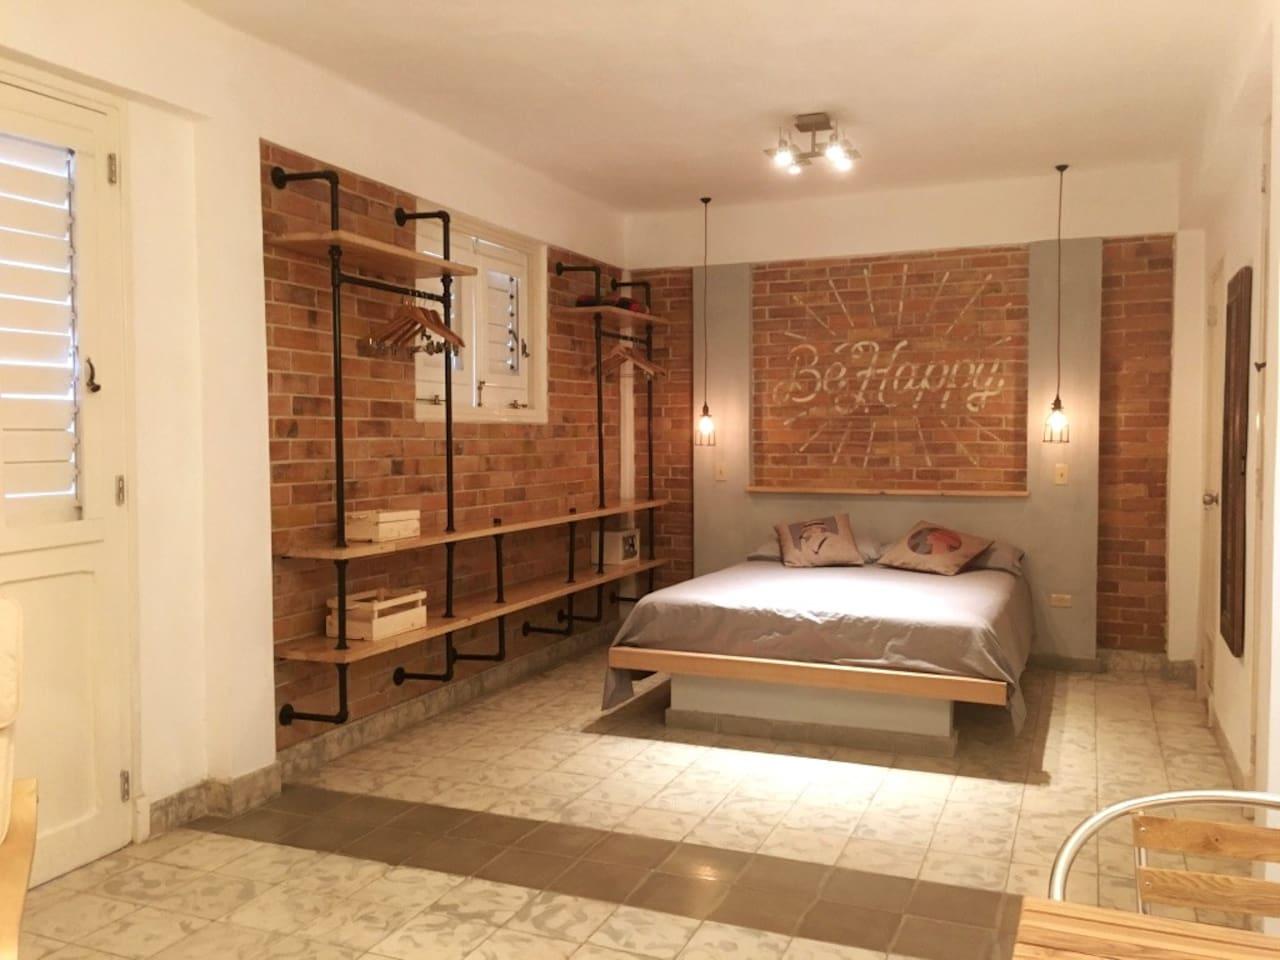 Spacious studio, over 30 m2, Queen size bed, vintage design